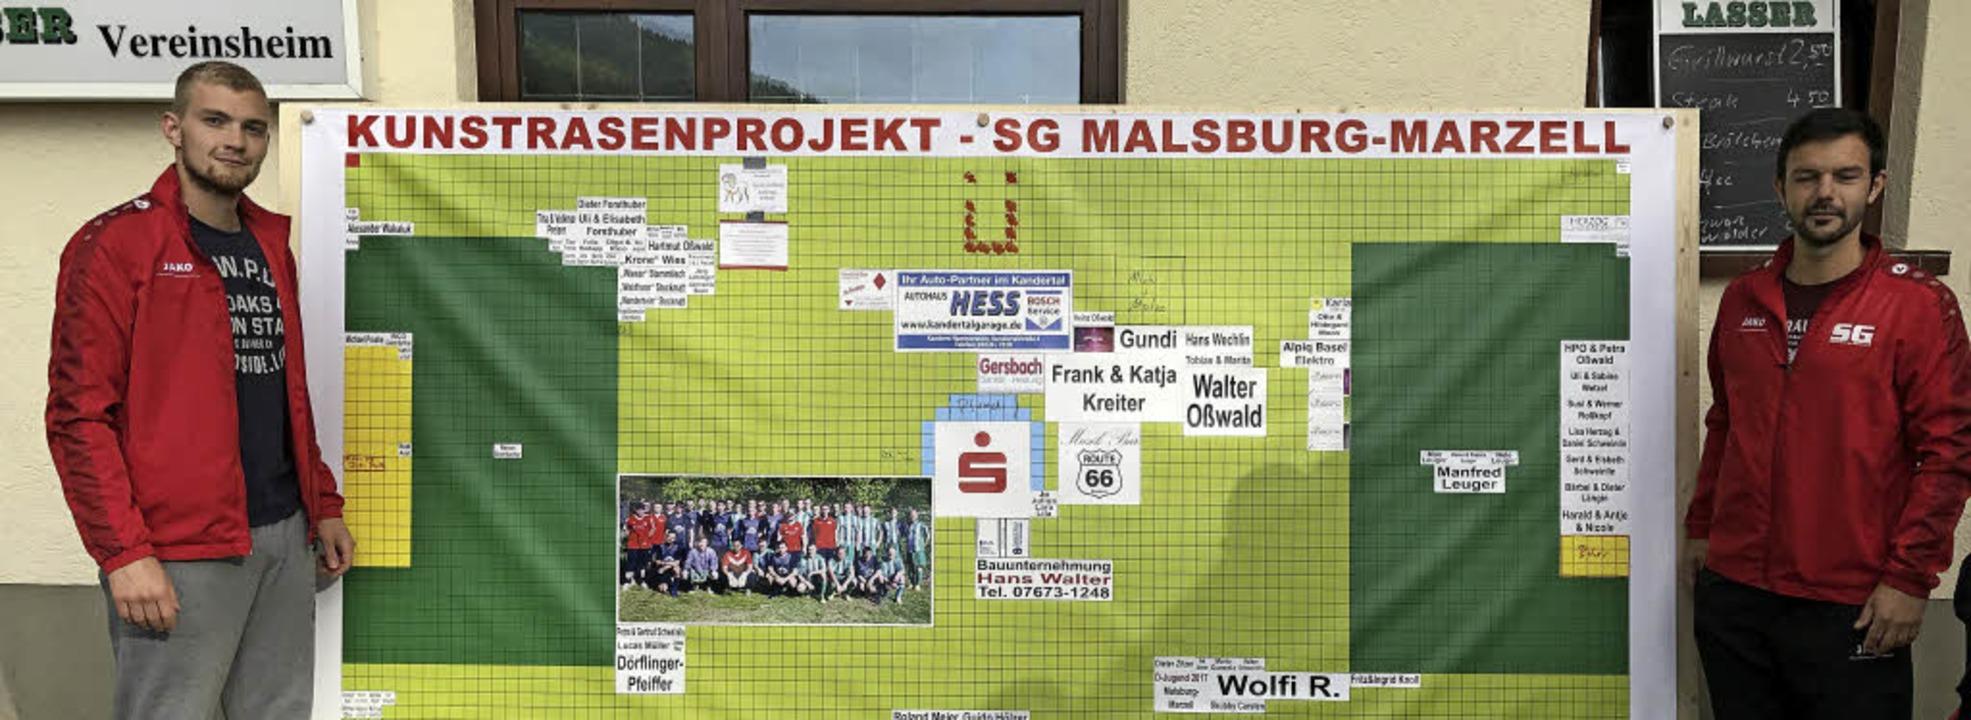 Spendertafel SV Malsburg  | Foto: Rolf-Dieter Kanmacher